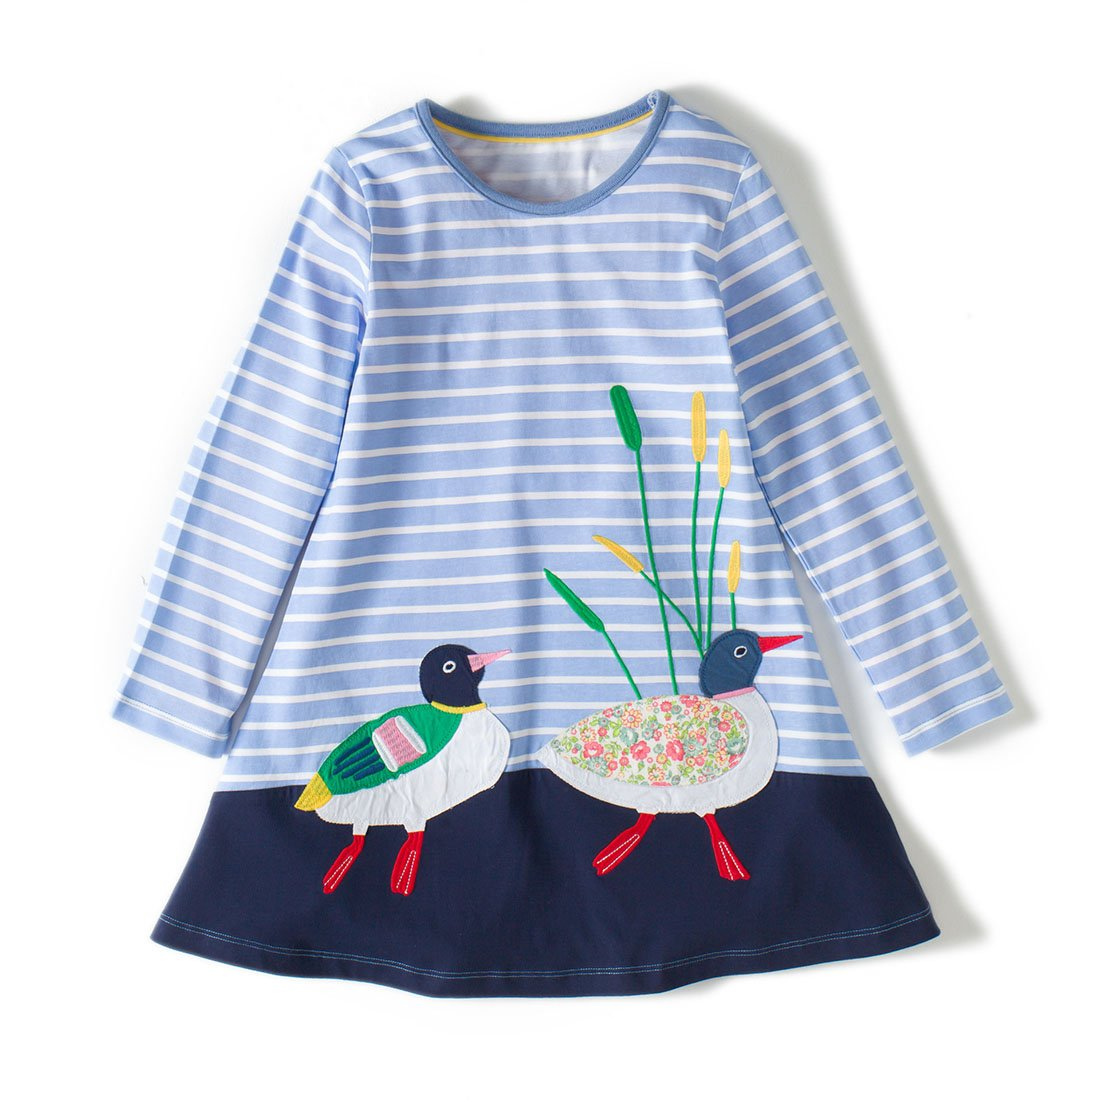 9ada0af45 Top2: Dan Ching Girls Cotton Long Sleeve Shirt Dress. Wholesale ...